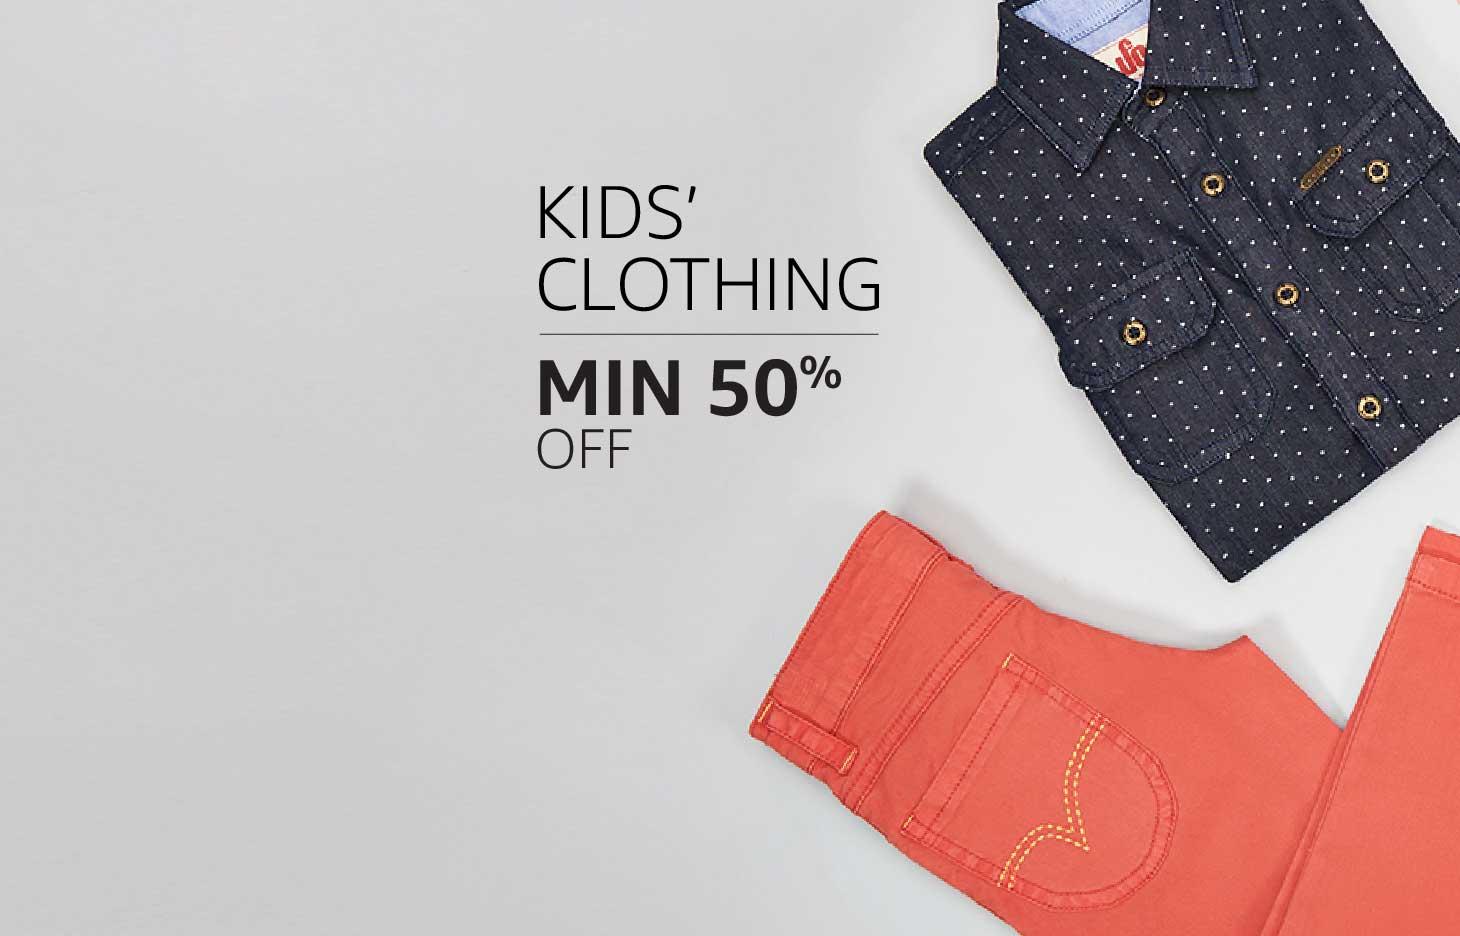 Kids' Clothing: Minimum 50% off